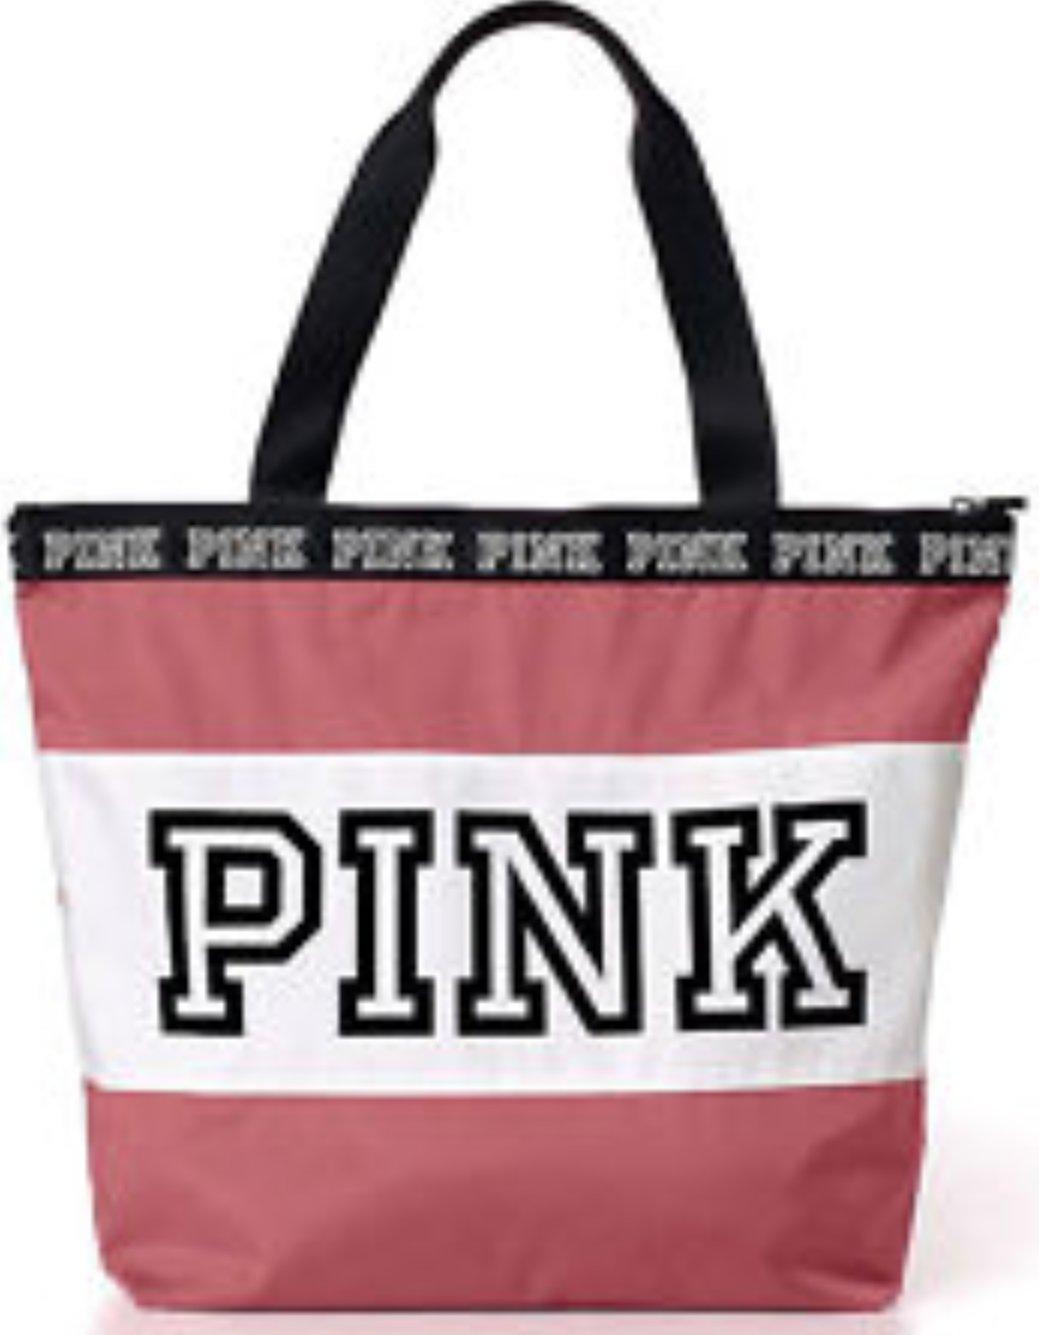 Victoria's Secret PINK Beach Travel Tote Zip Top Bag Begonia / Grey / Black (Begonia)